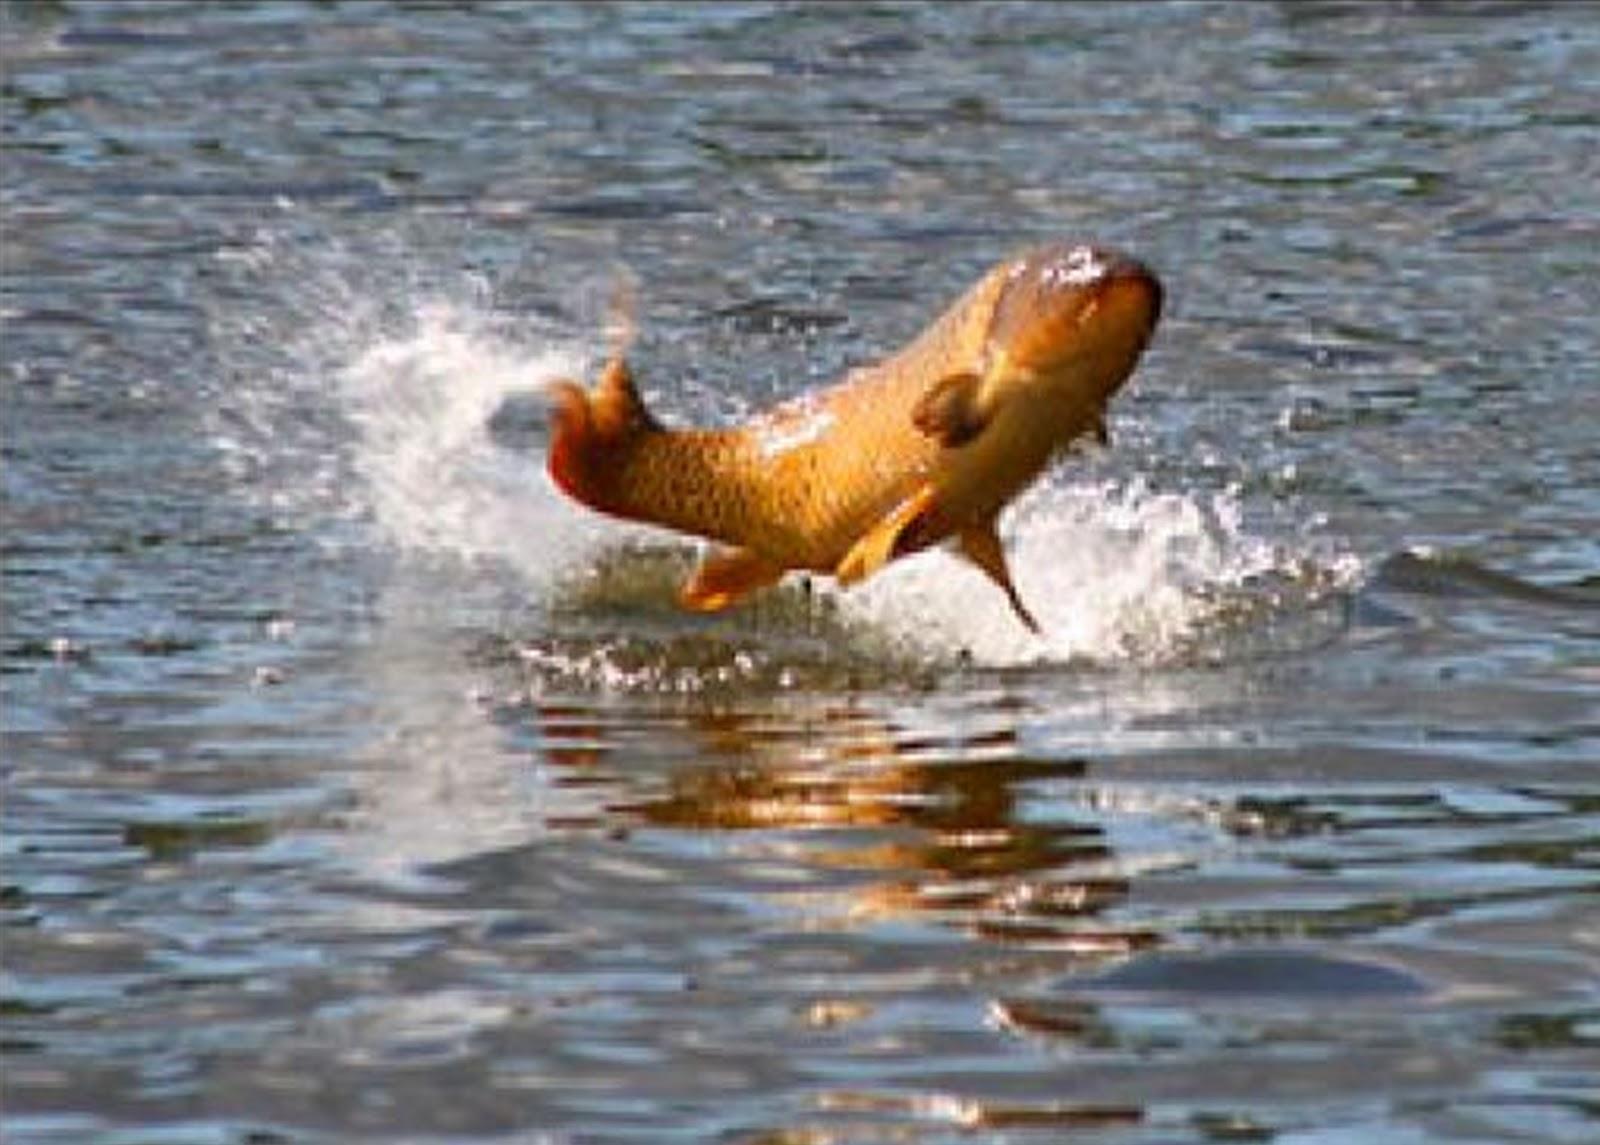 Common carp for Carp fish pictures